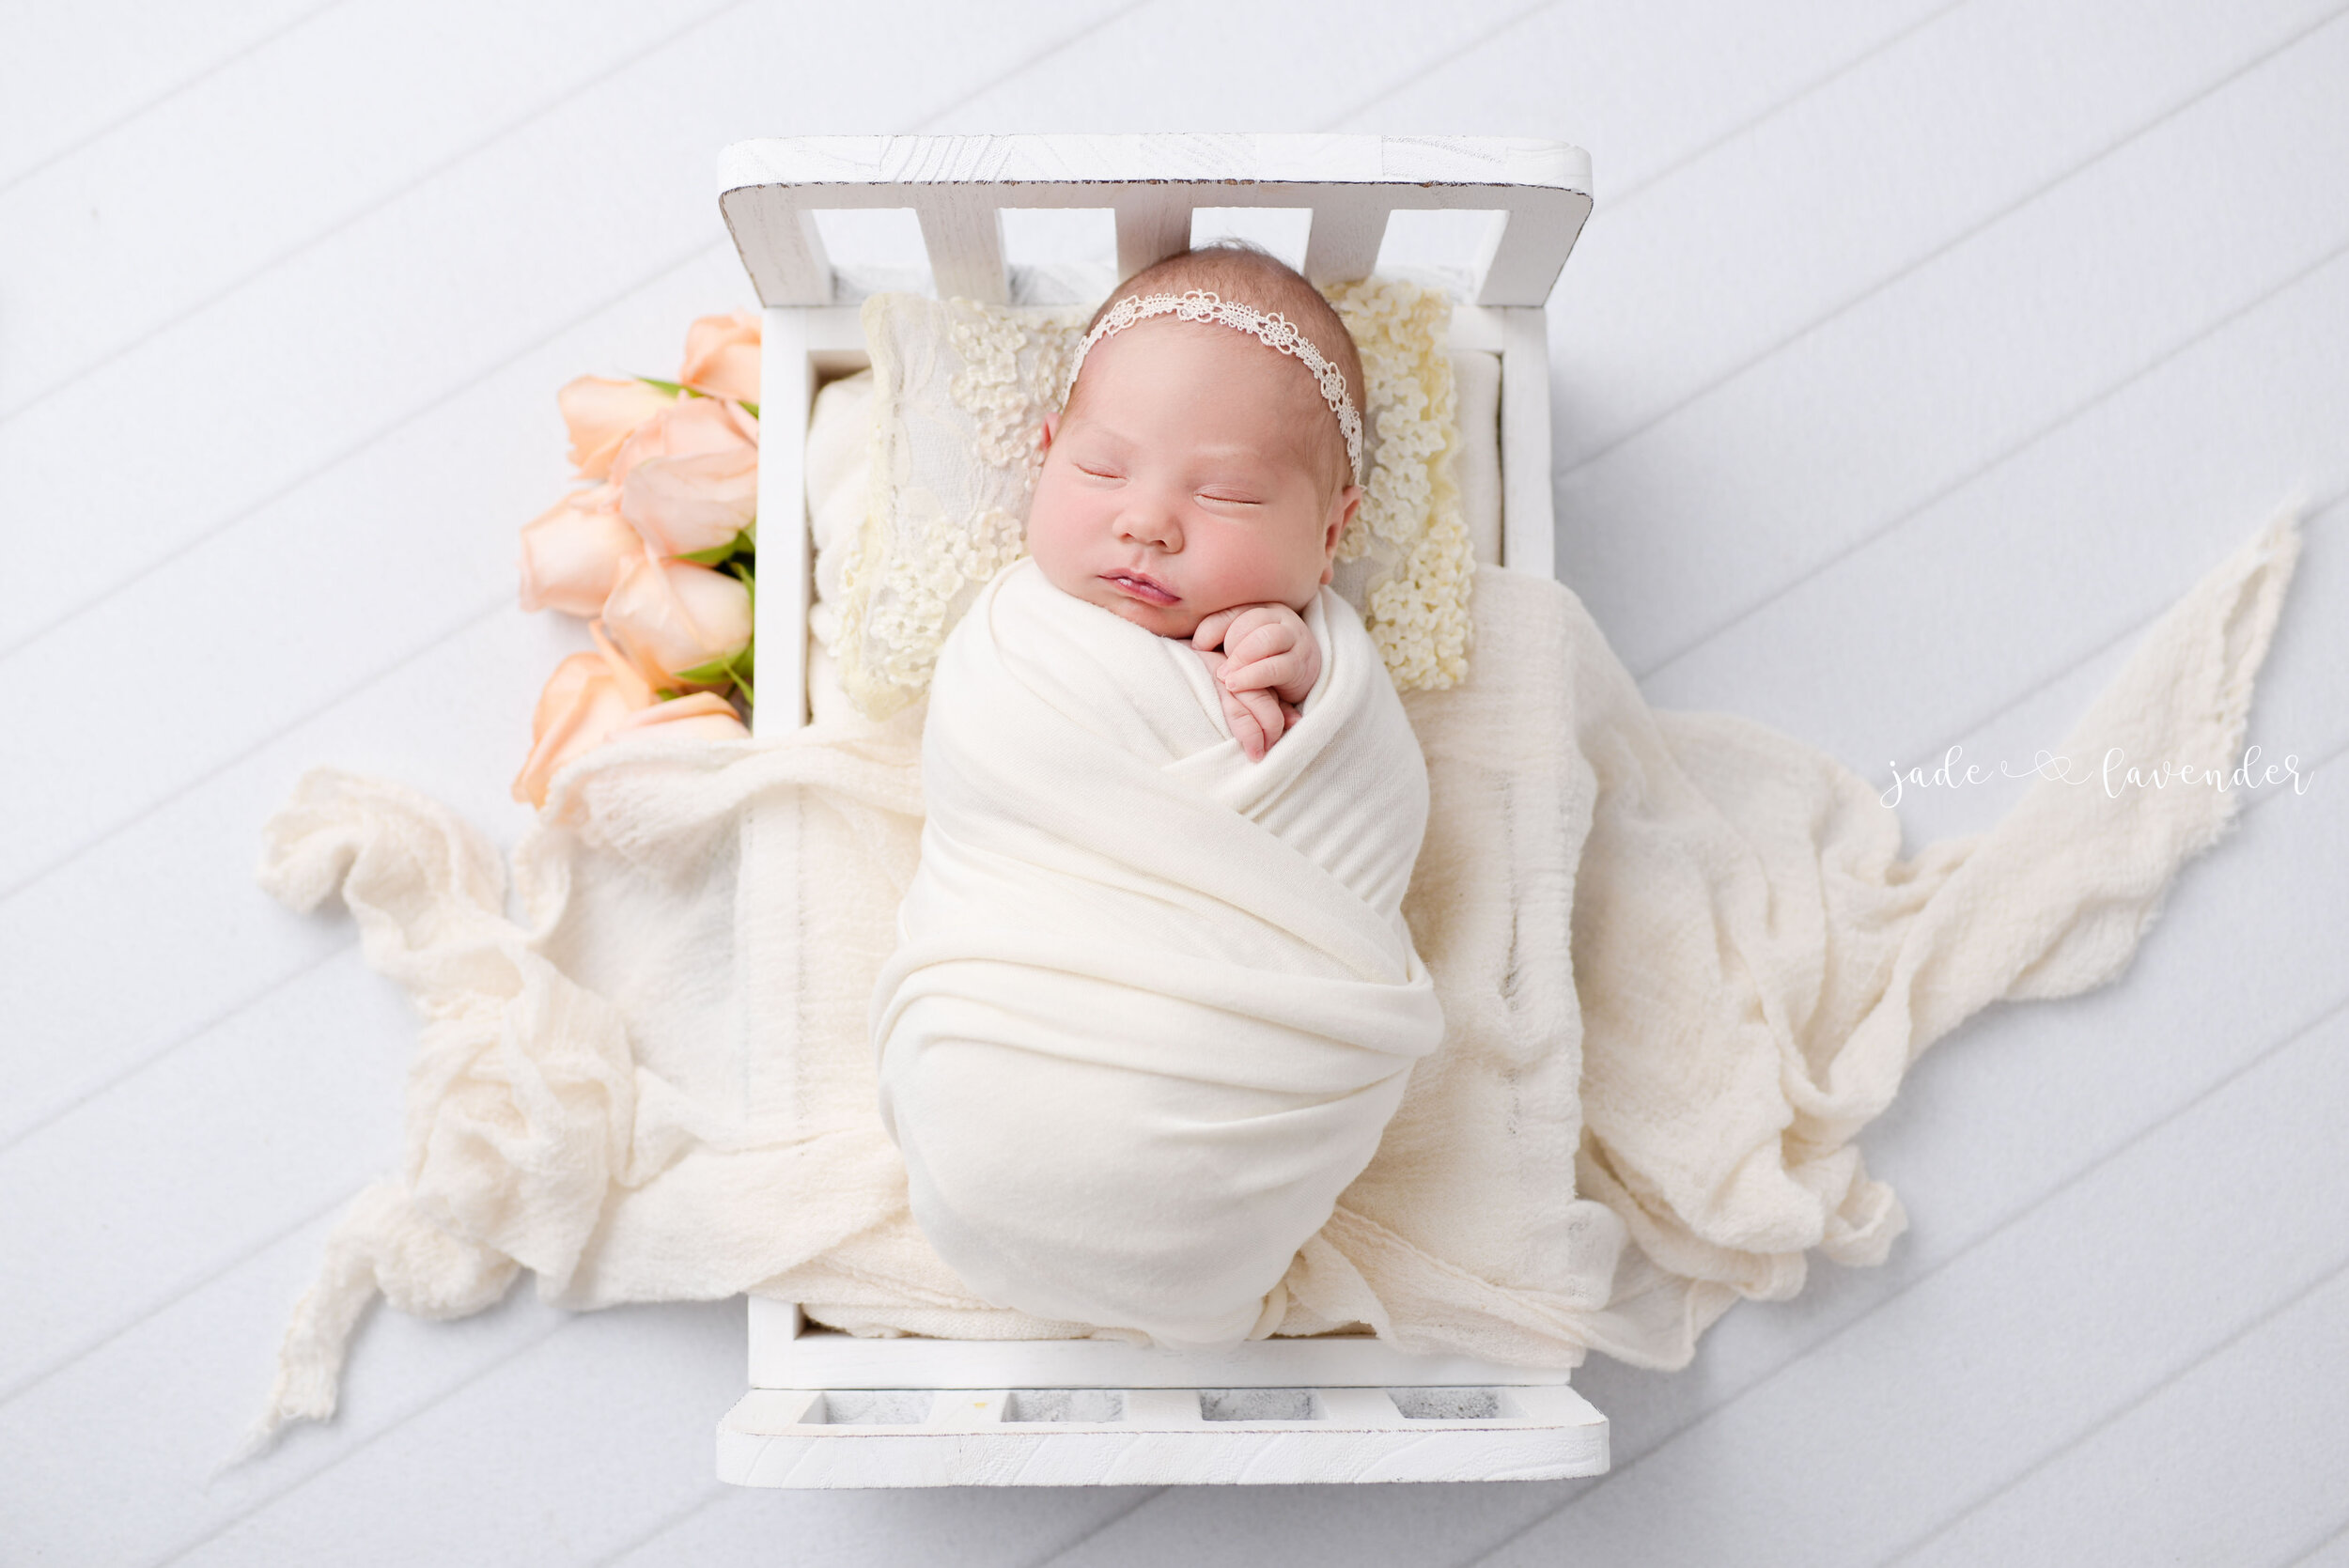 newborn-photography-baby-images-infant-photos-girl-floral-spokane-washington (4 of 6).jpg